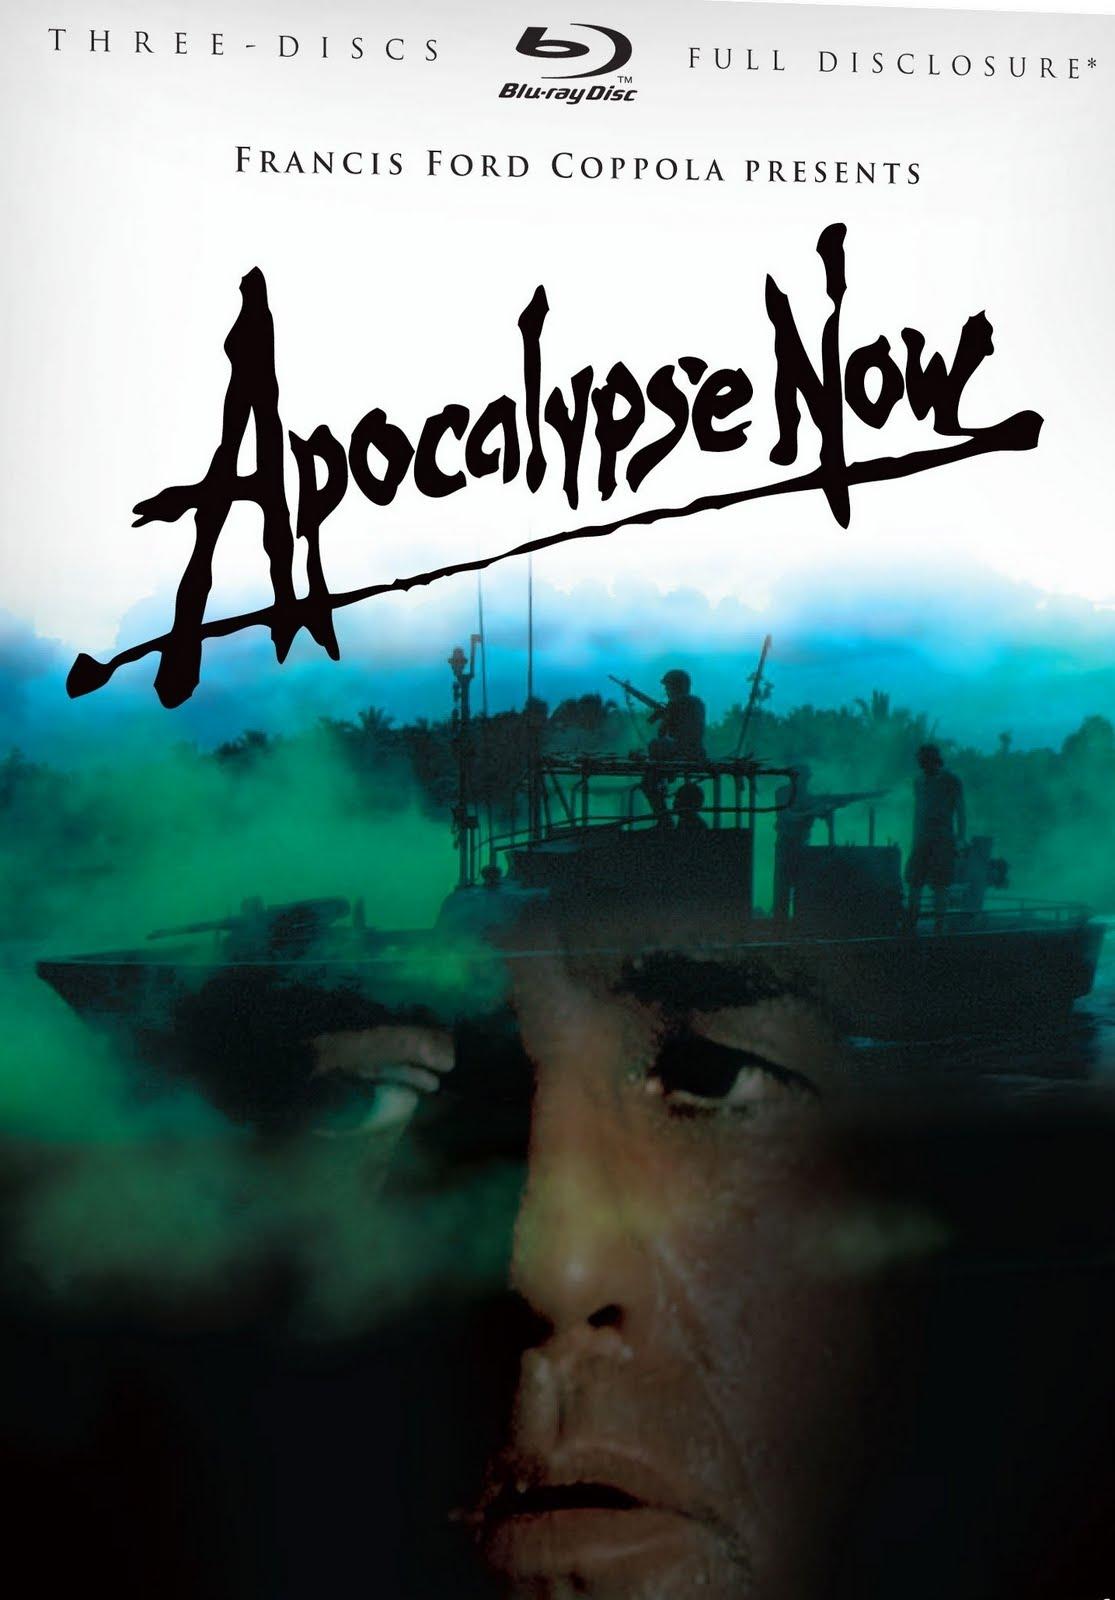 http://3.bp.blogspot.com/_VRME60-RLag/TL4LtSFdGQI/AAAAAAAAJEs/PHvJbGZWdgg/s1600/apocalypse-now-blu-ray-cover.jpg